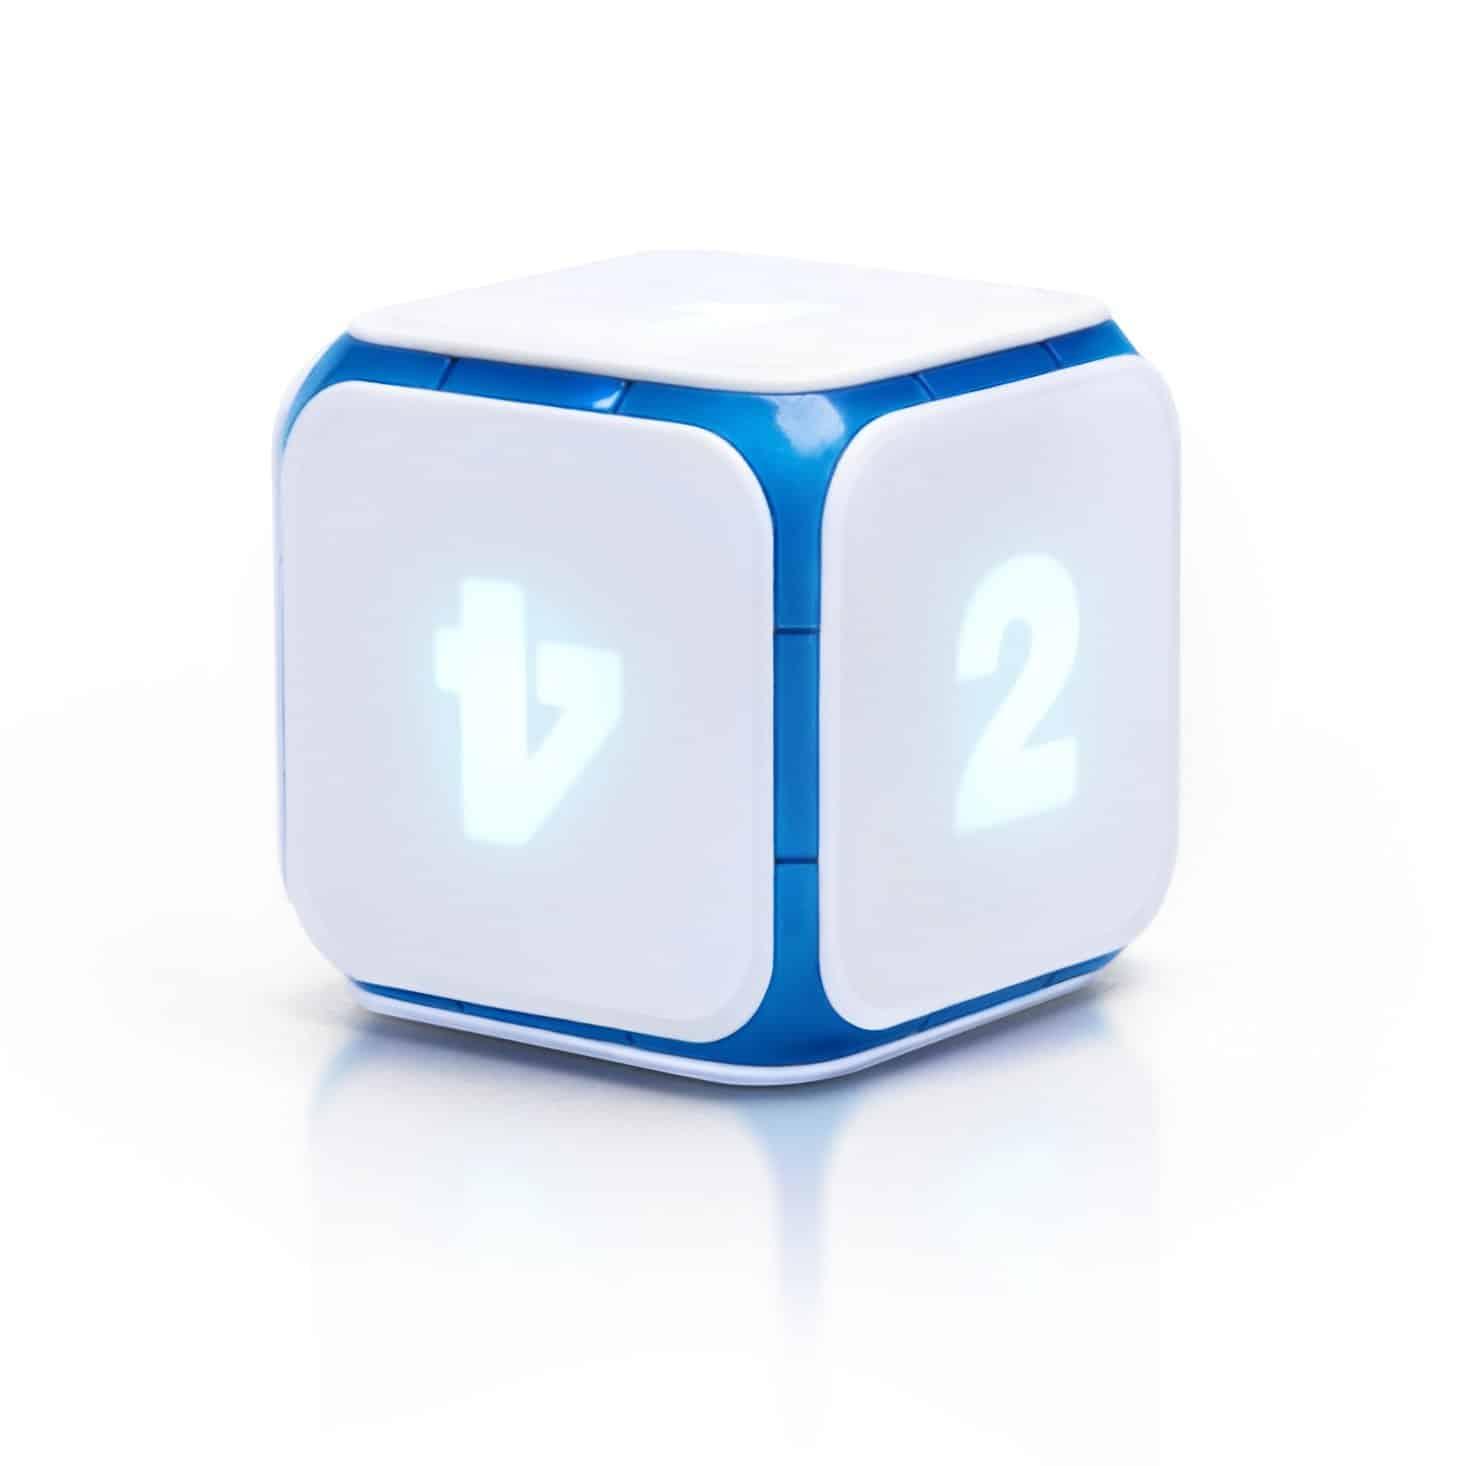 DICE+ Bluetooth Gaming Dice LED Lights